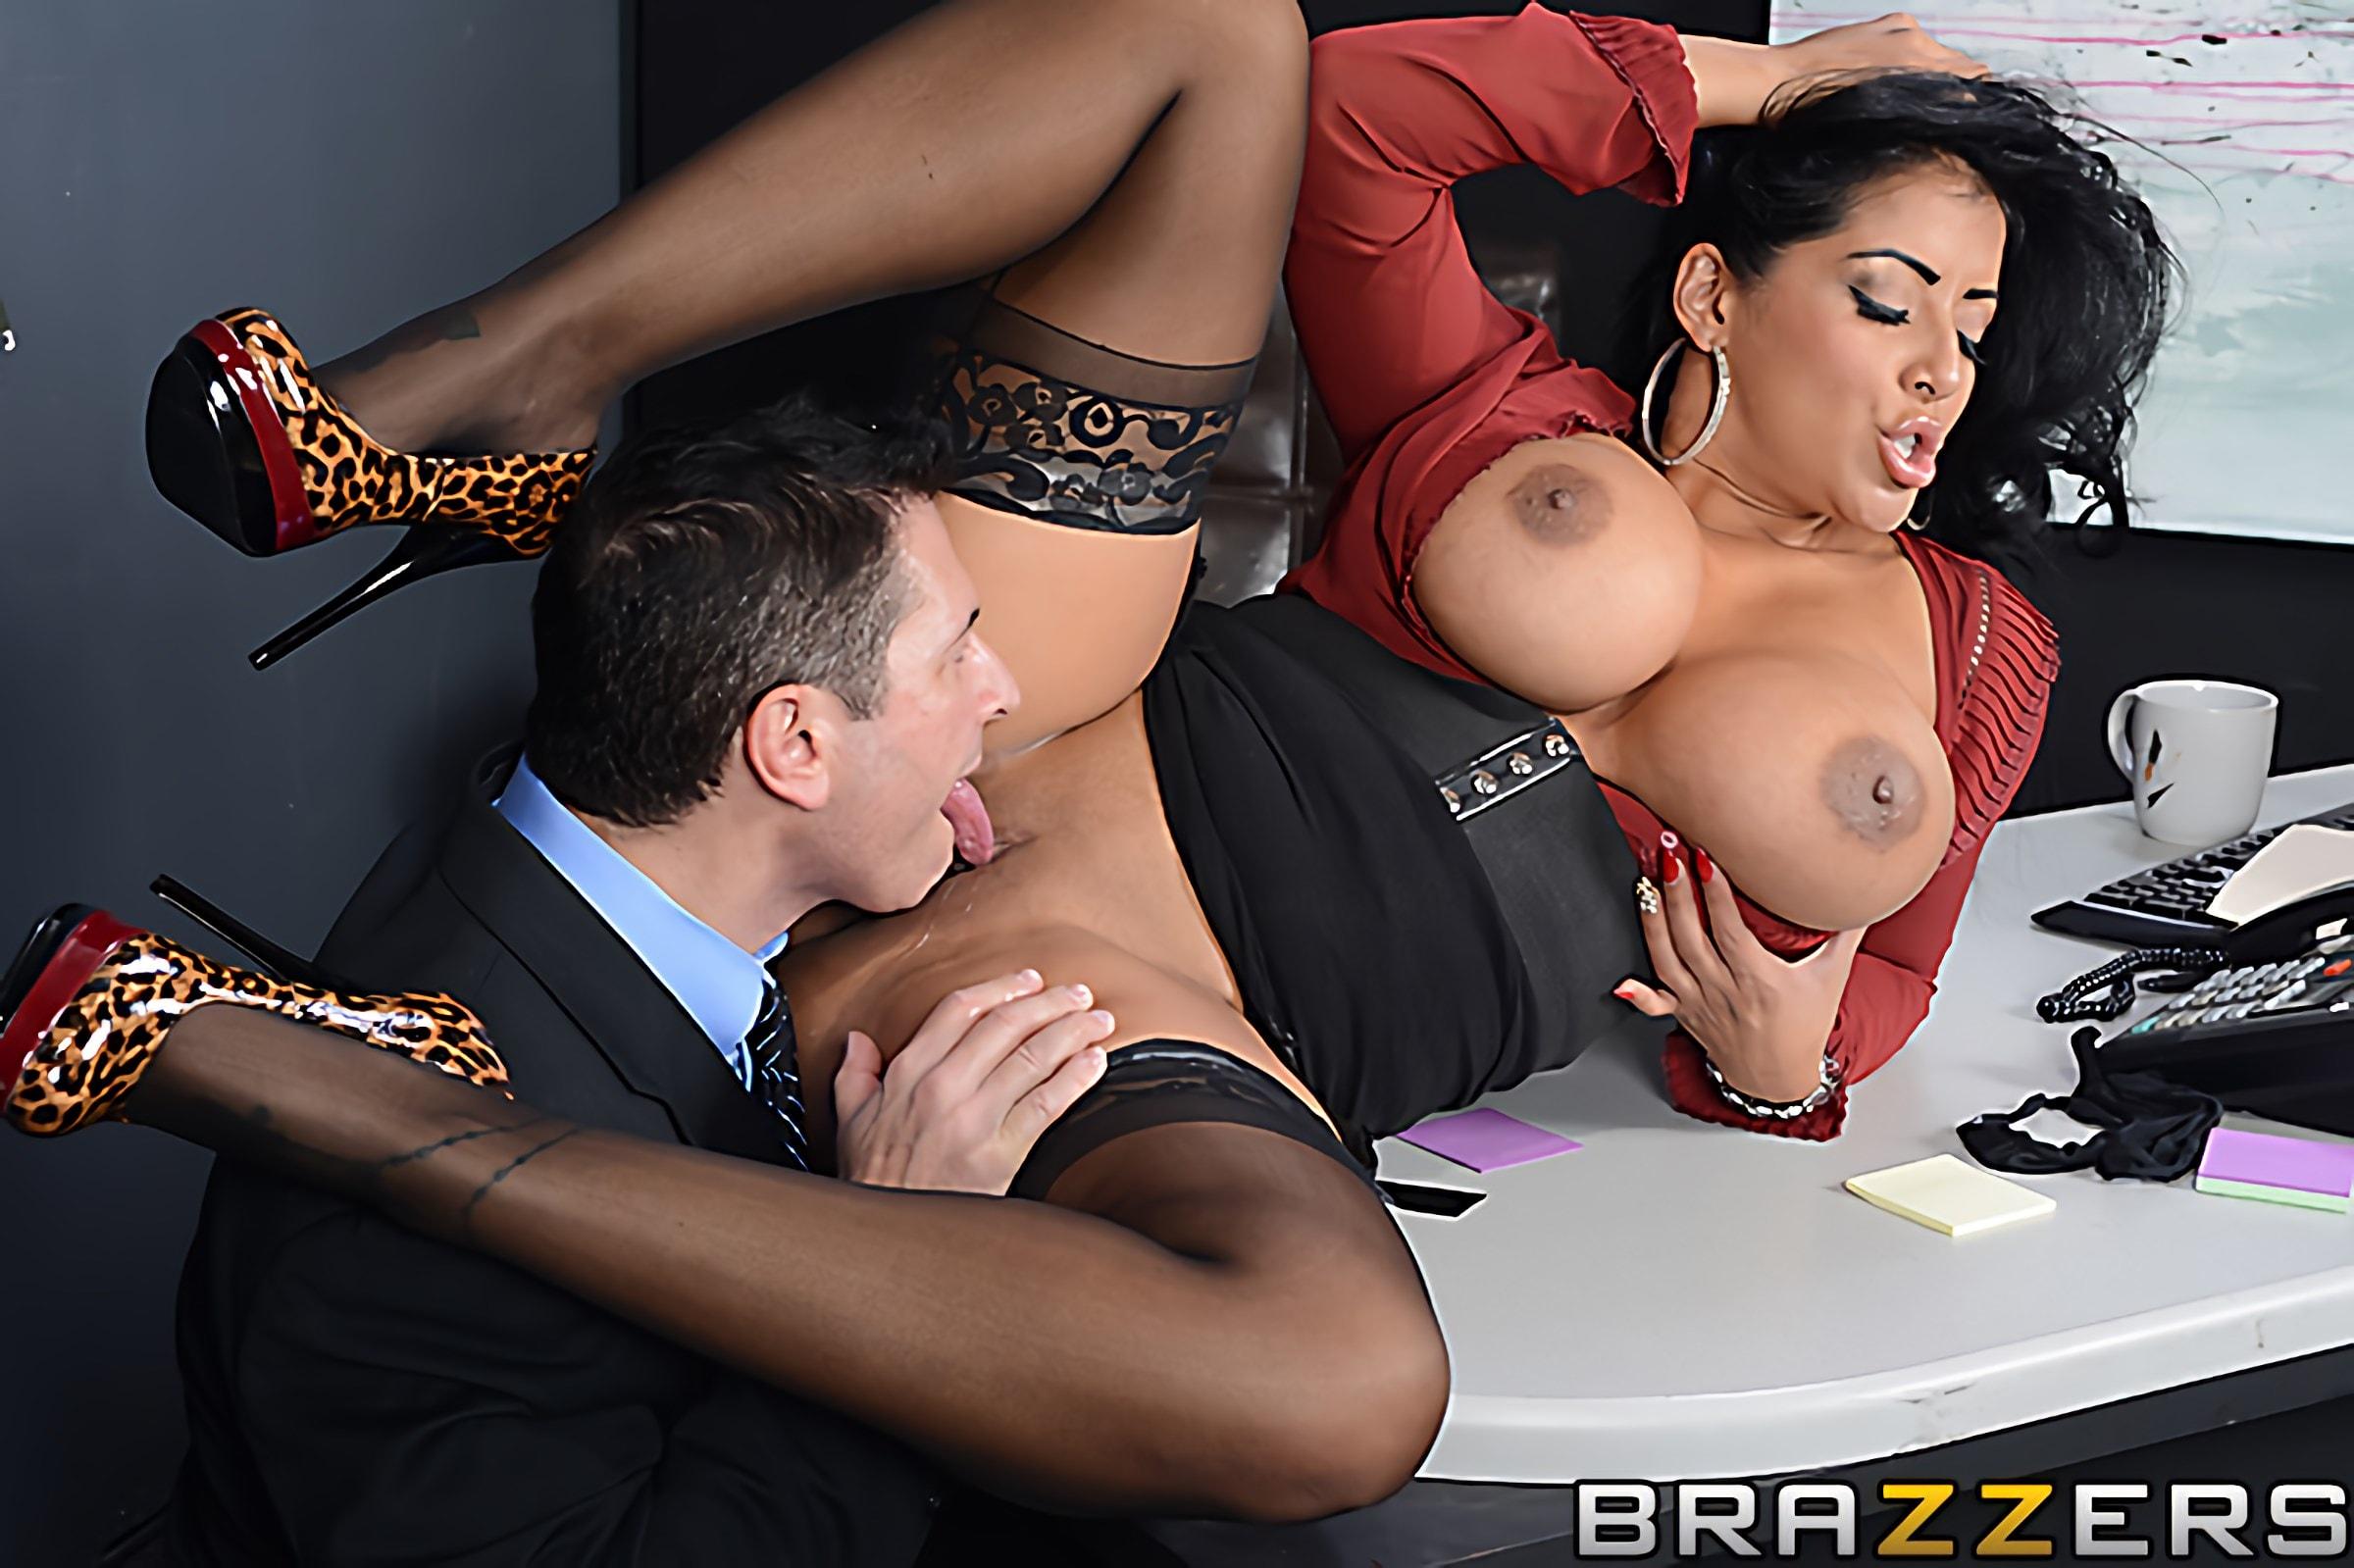 Brazzers 'My Boss Is A Creep' starring Kiara Mia (Photo 10)